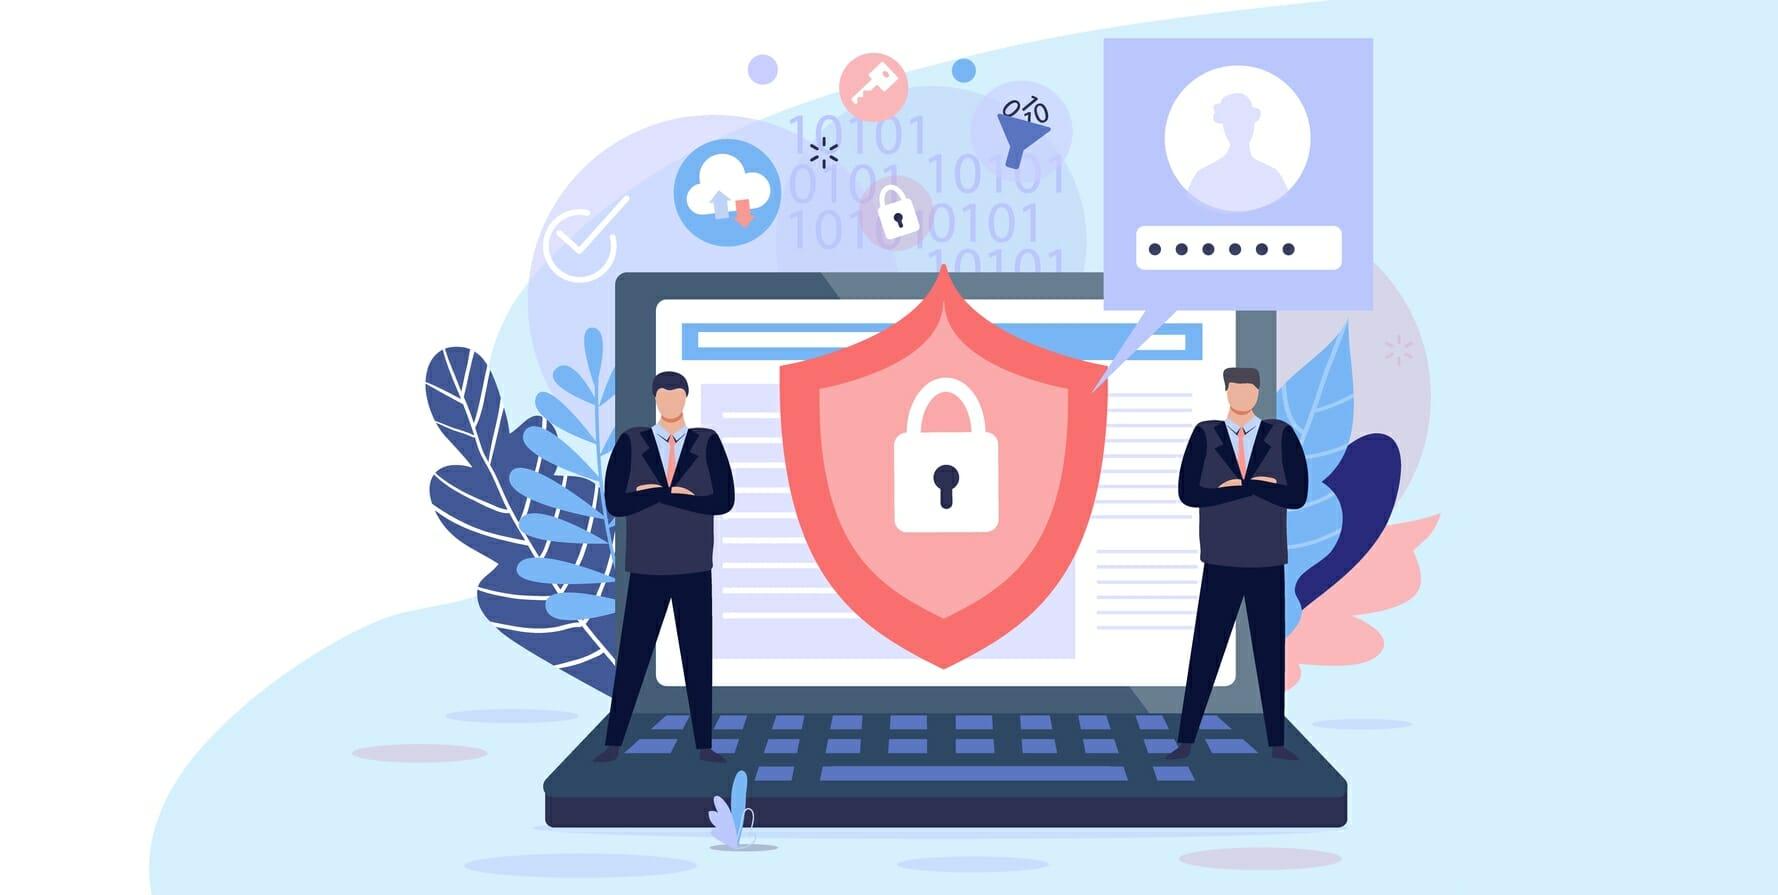 VPN provides the security solution when using Putlocker sites